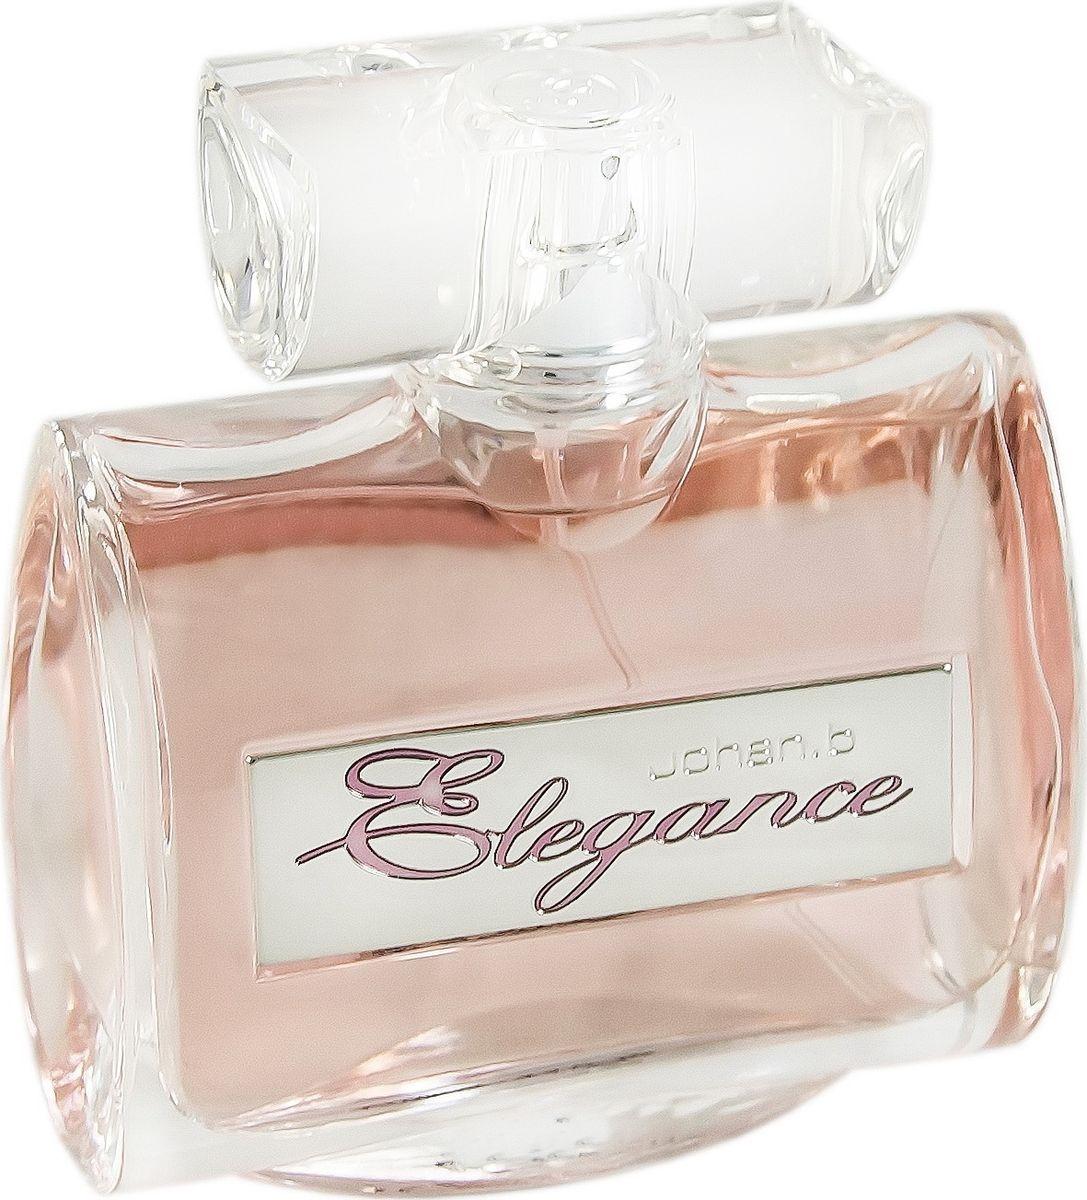 Geparlys Парфюмерная вода Elegance women Линии Johan.B, 100 мл geparlys beautiful lady